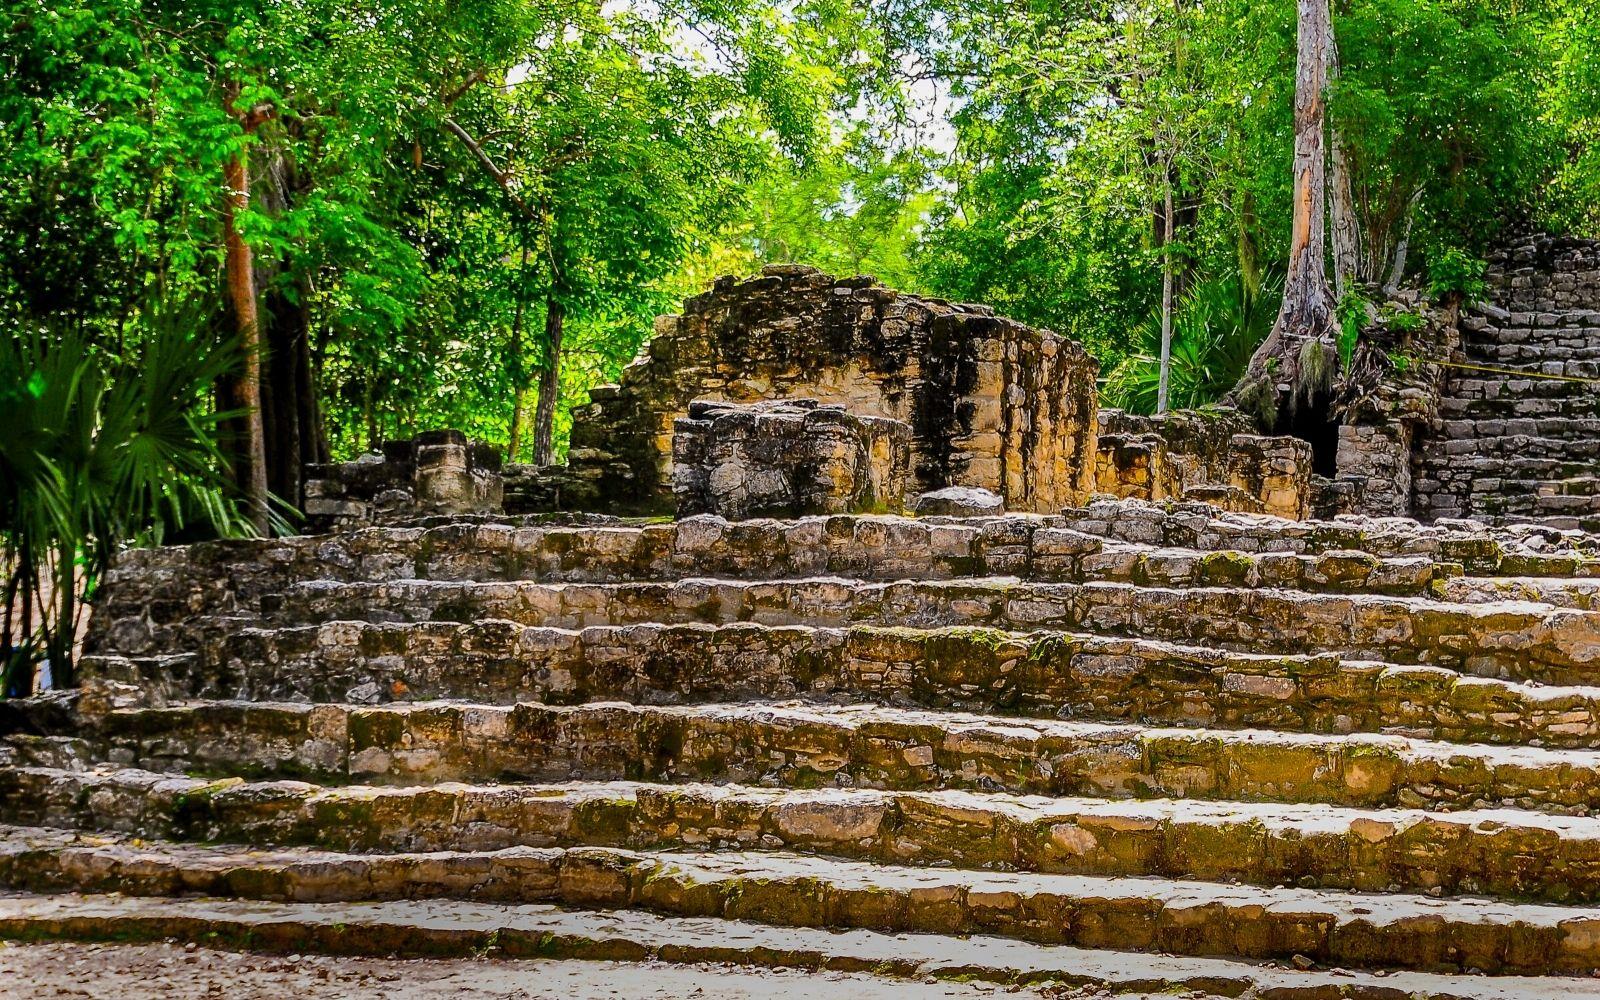 Visiting Coba, Mexico: A Guide To The Mayan Ruins